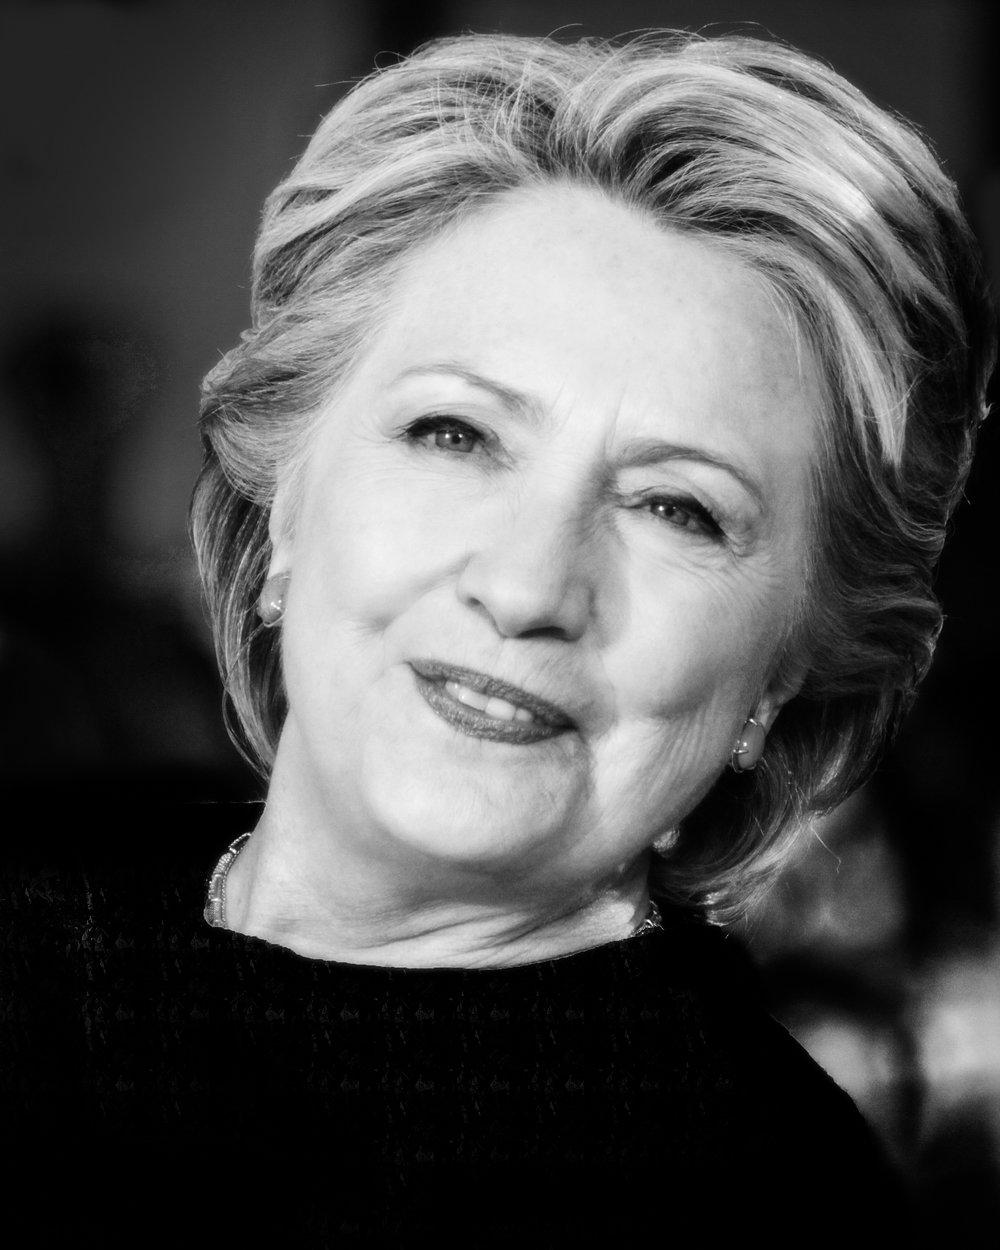 Hillary Clinton Portrait 20